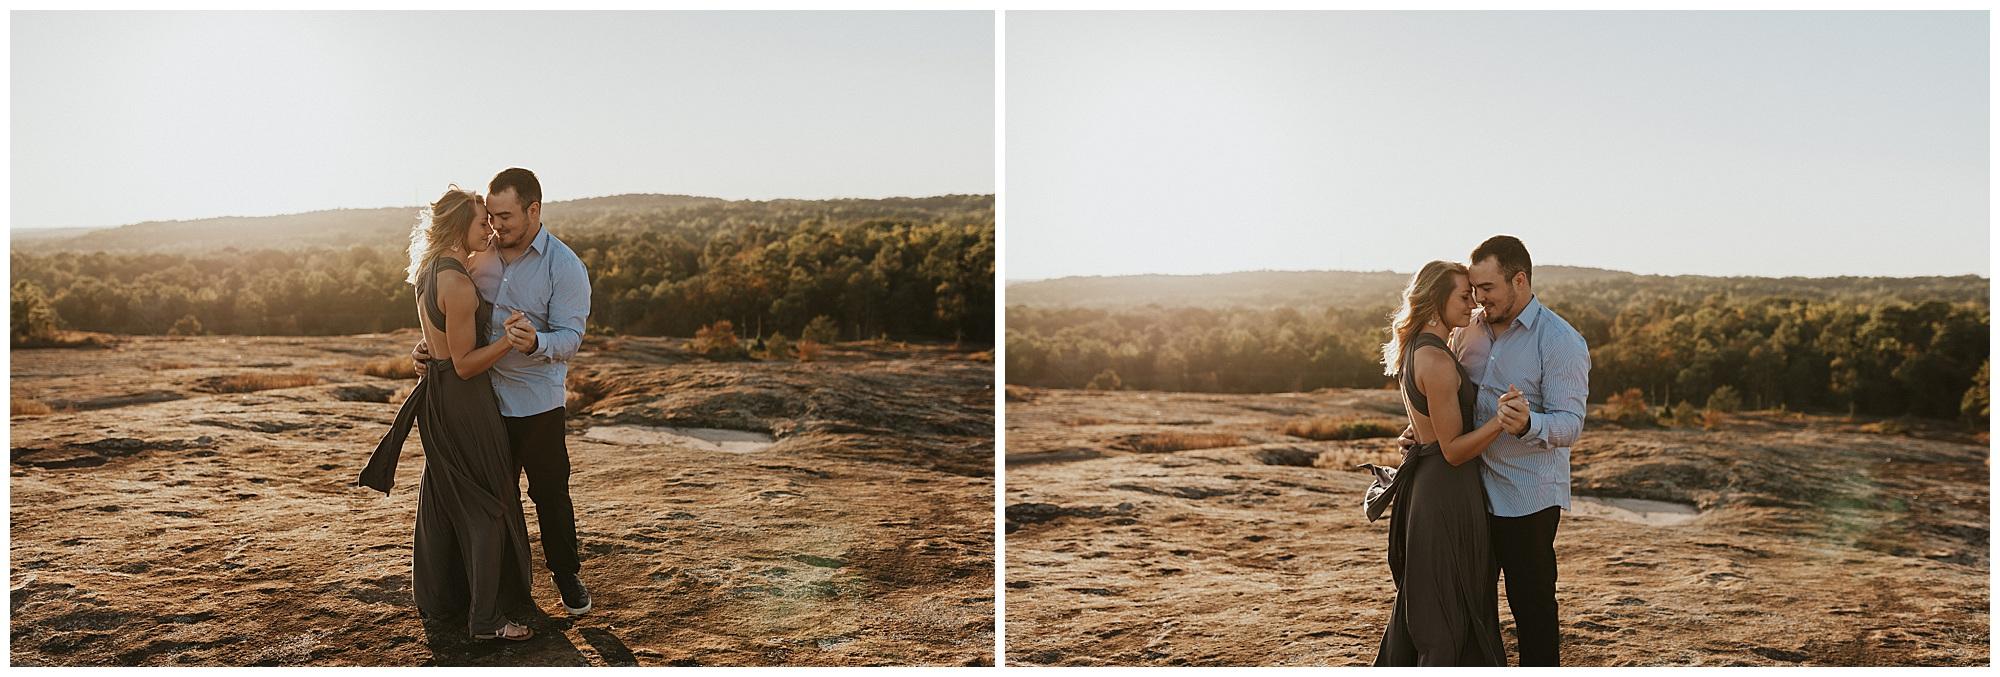 coloradoweddingphotographer_0321.jpg